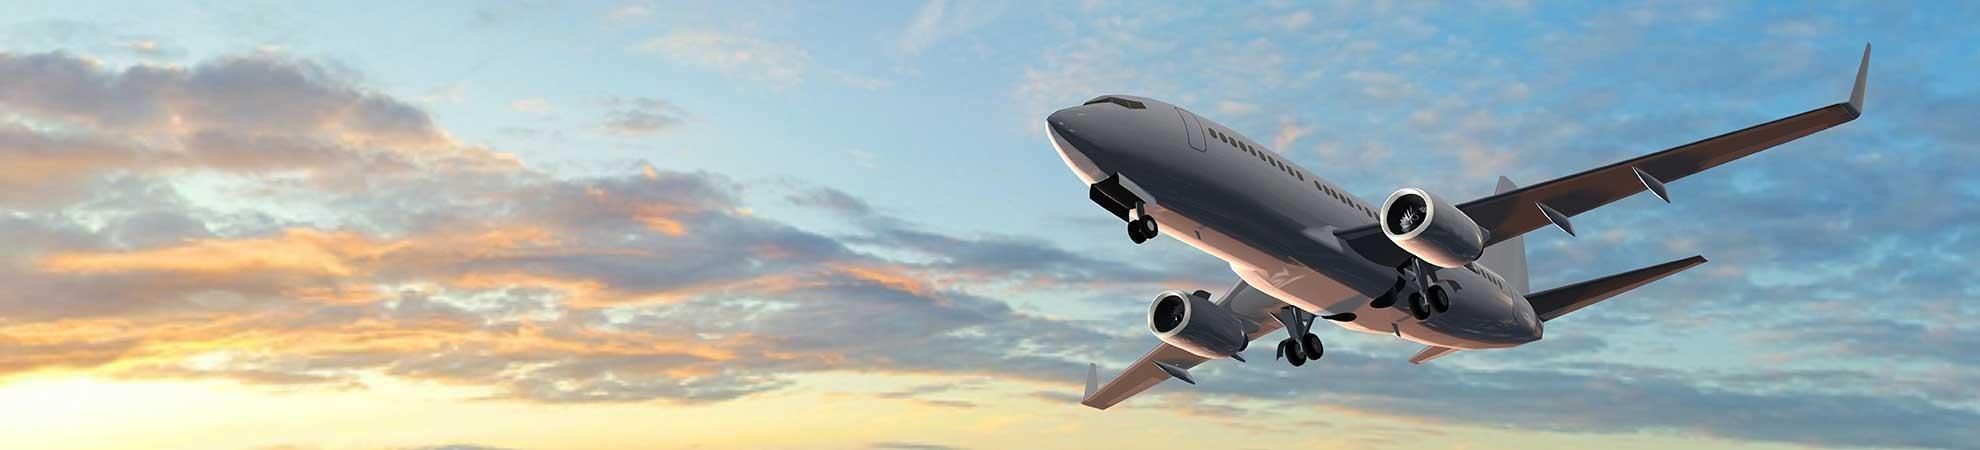 Infos pratiques vols internationaux